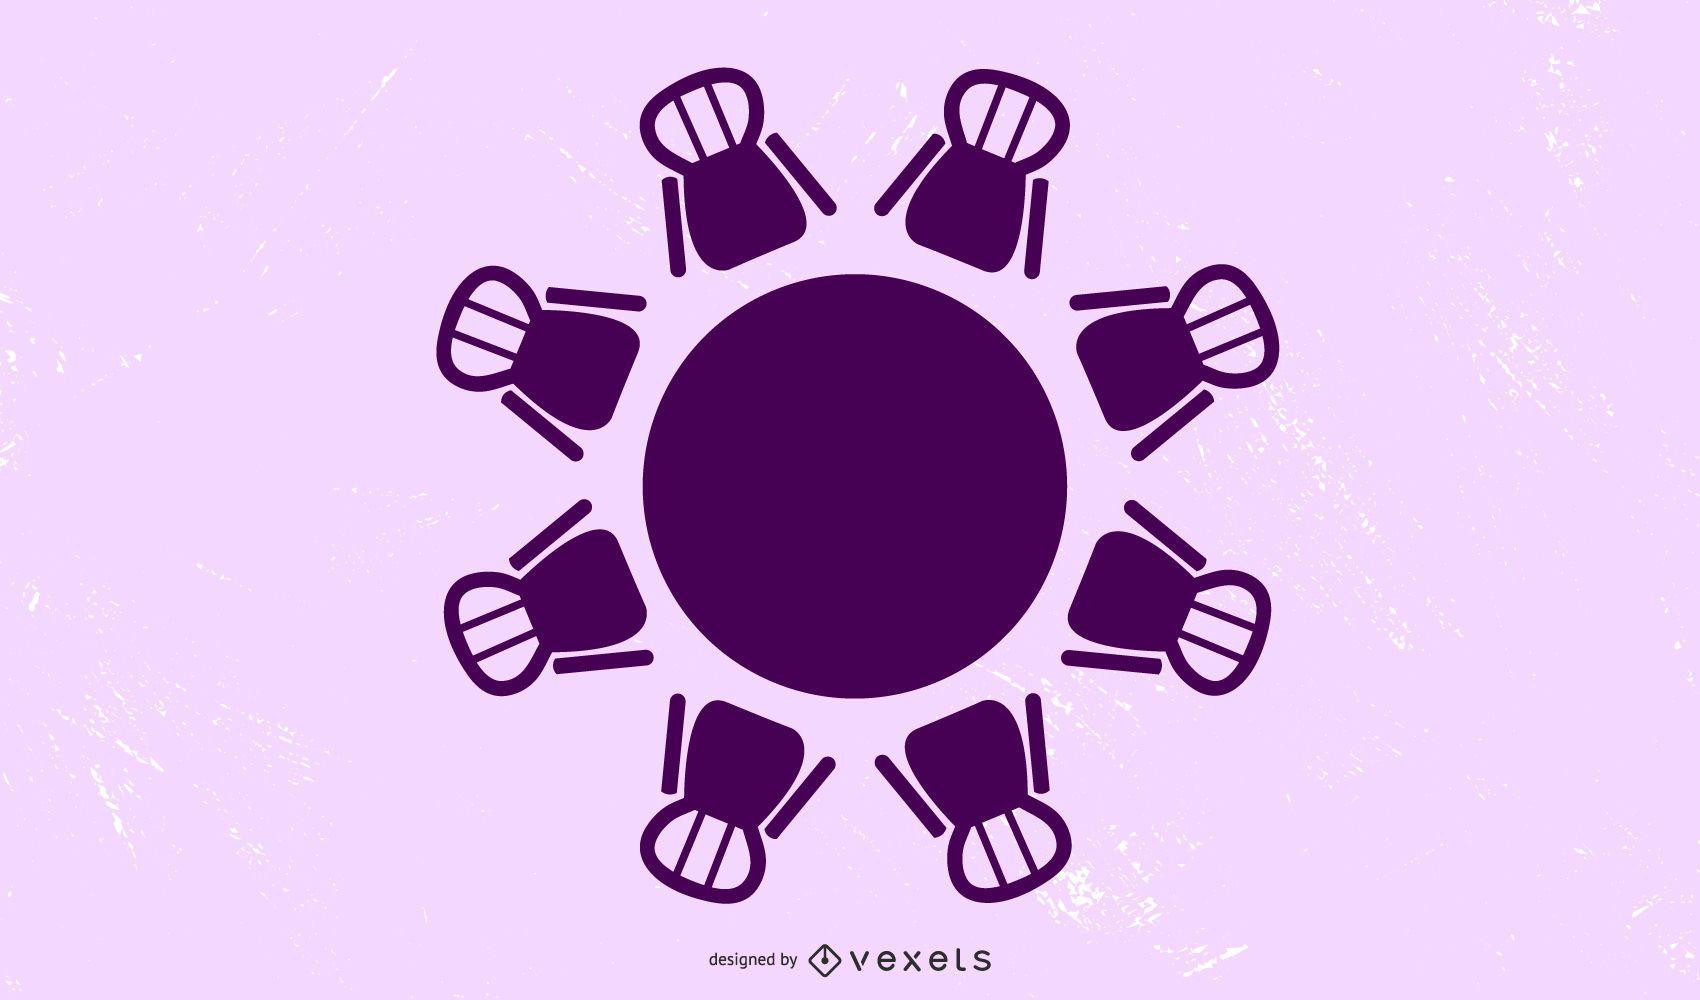 purple table chairs illustration